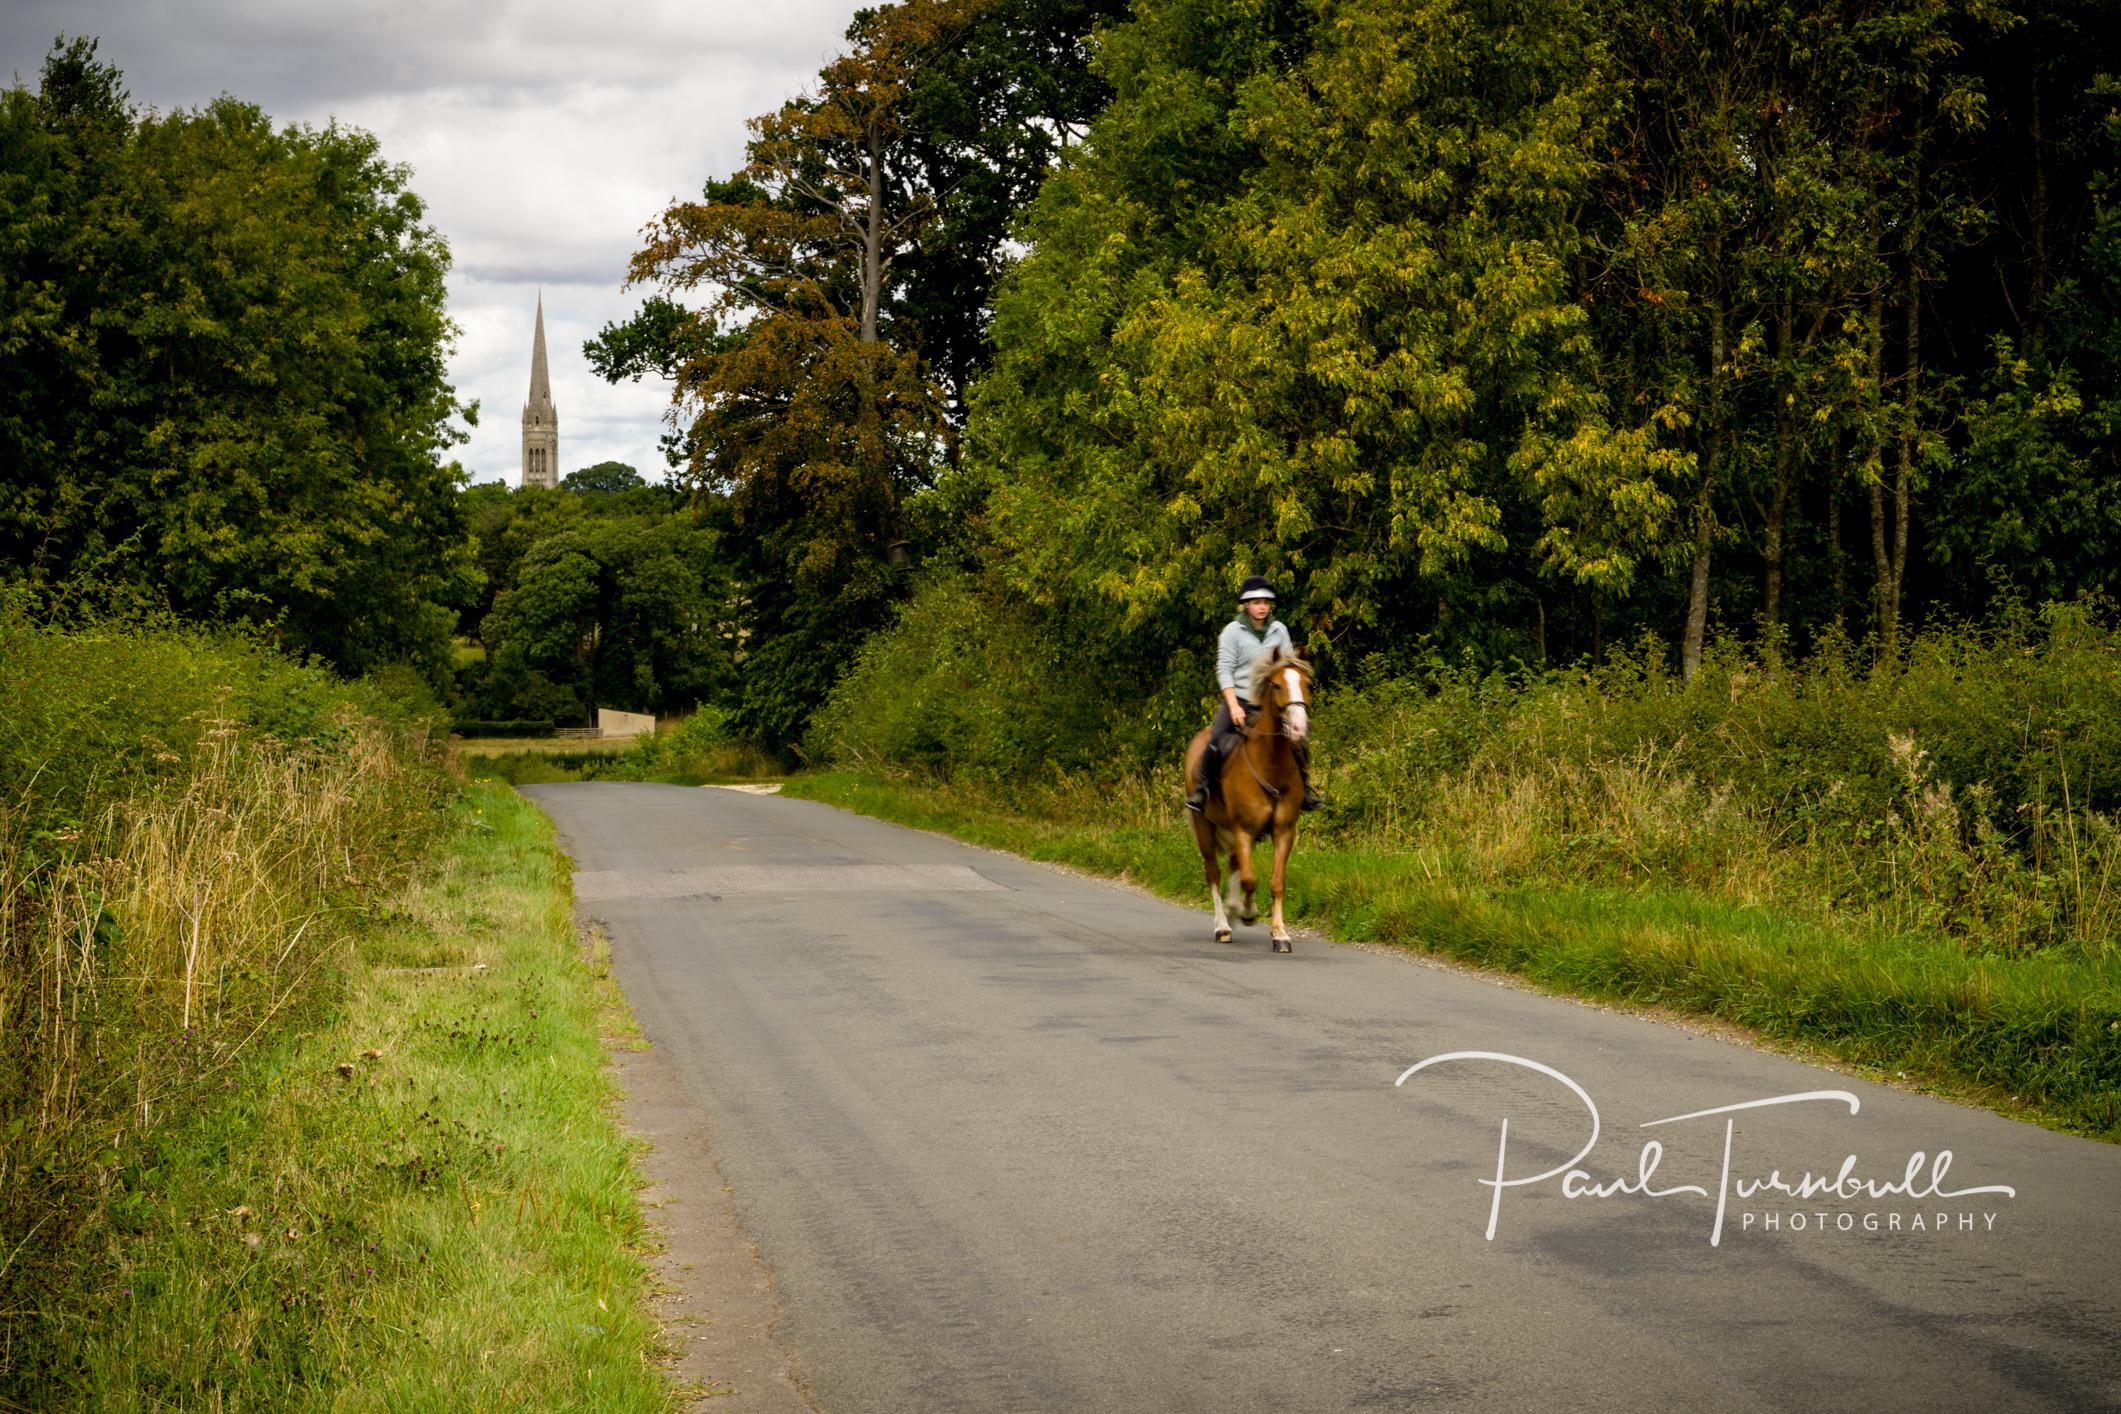 wedding-photographer-south-dalton-walkington-yorkshire-emma-james-025.jpg